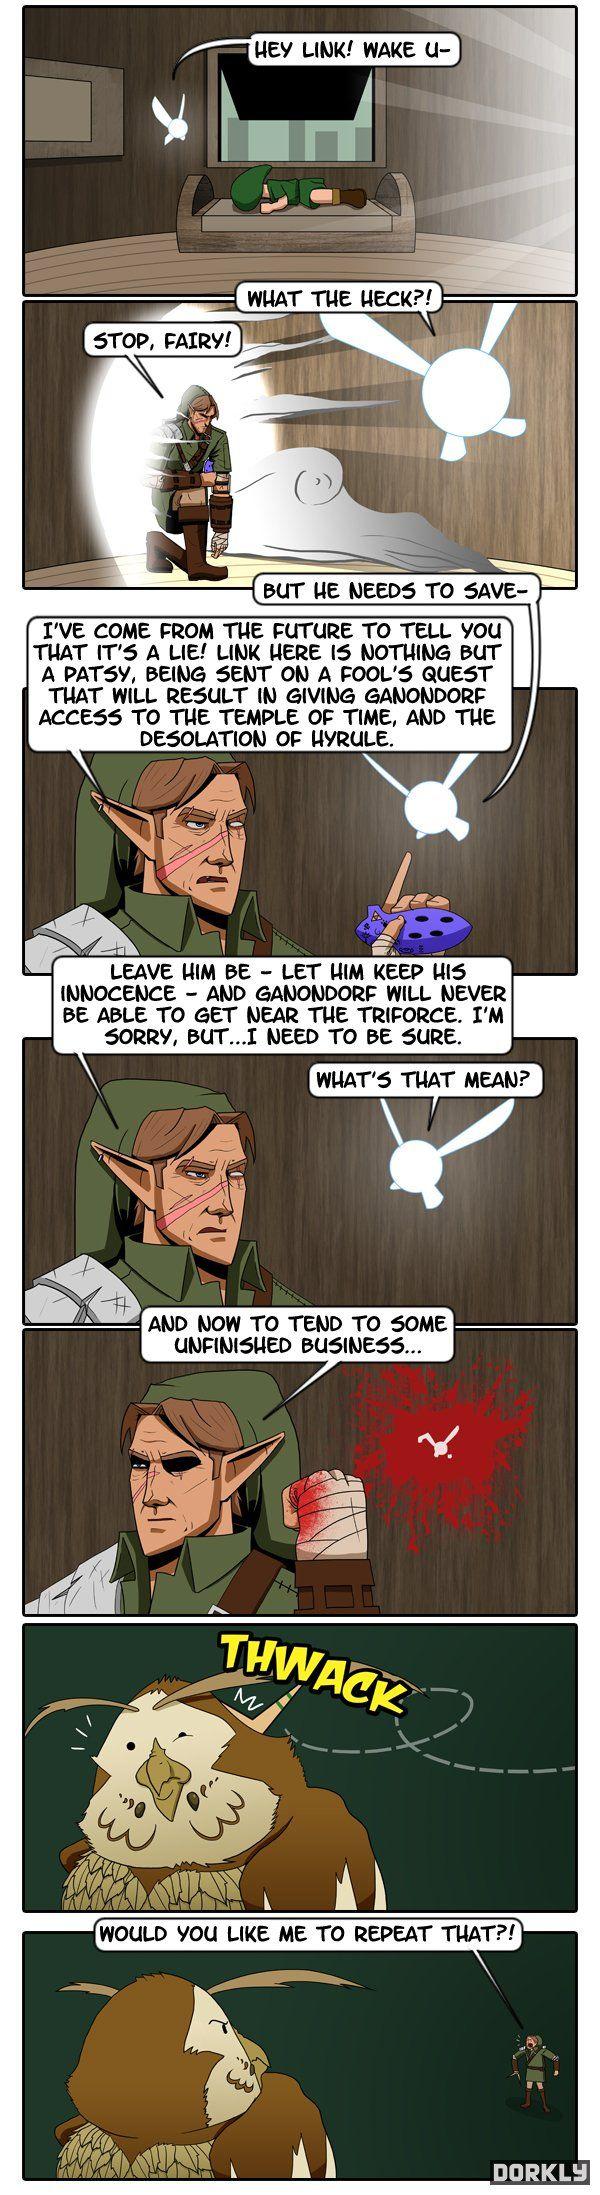 So true! Don't do it! #Truth #lols #video #game #Funny #Videogame #Gaming #References #Reality #Real #Life #Joke #Geek #Nerd #humor #Funny #Winning #Laugh #Logic #Gamer #Zelda #Legend #Hero #Link #Time #Navi